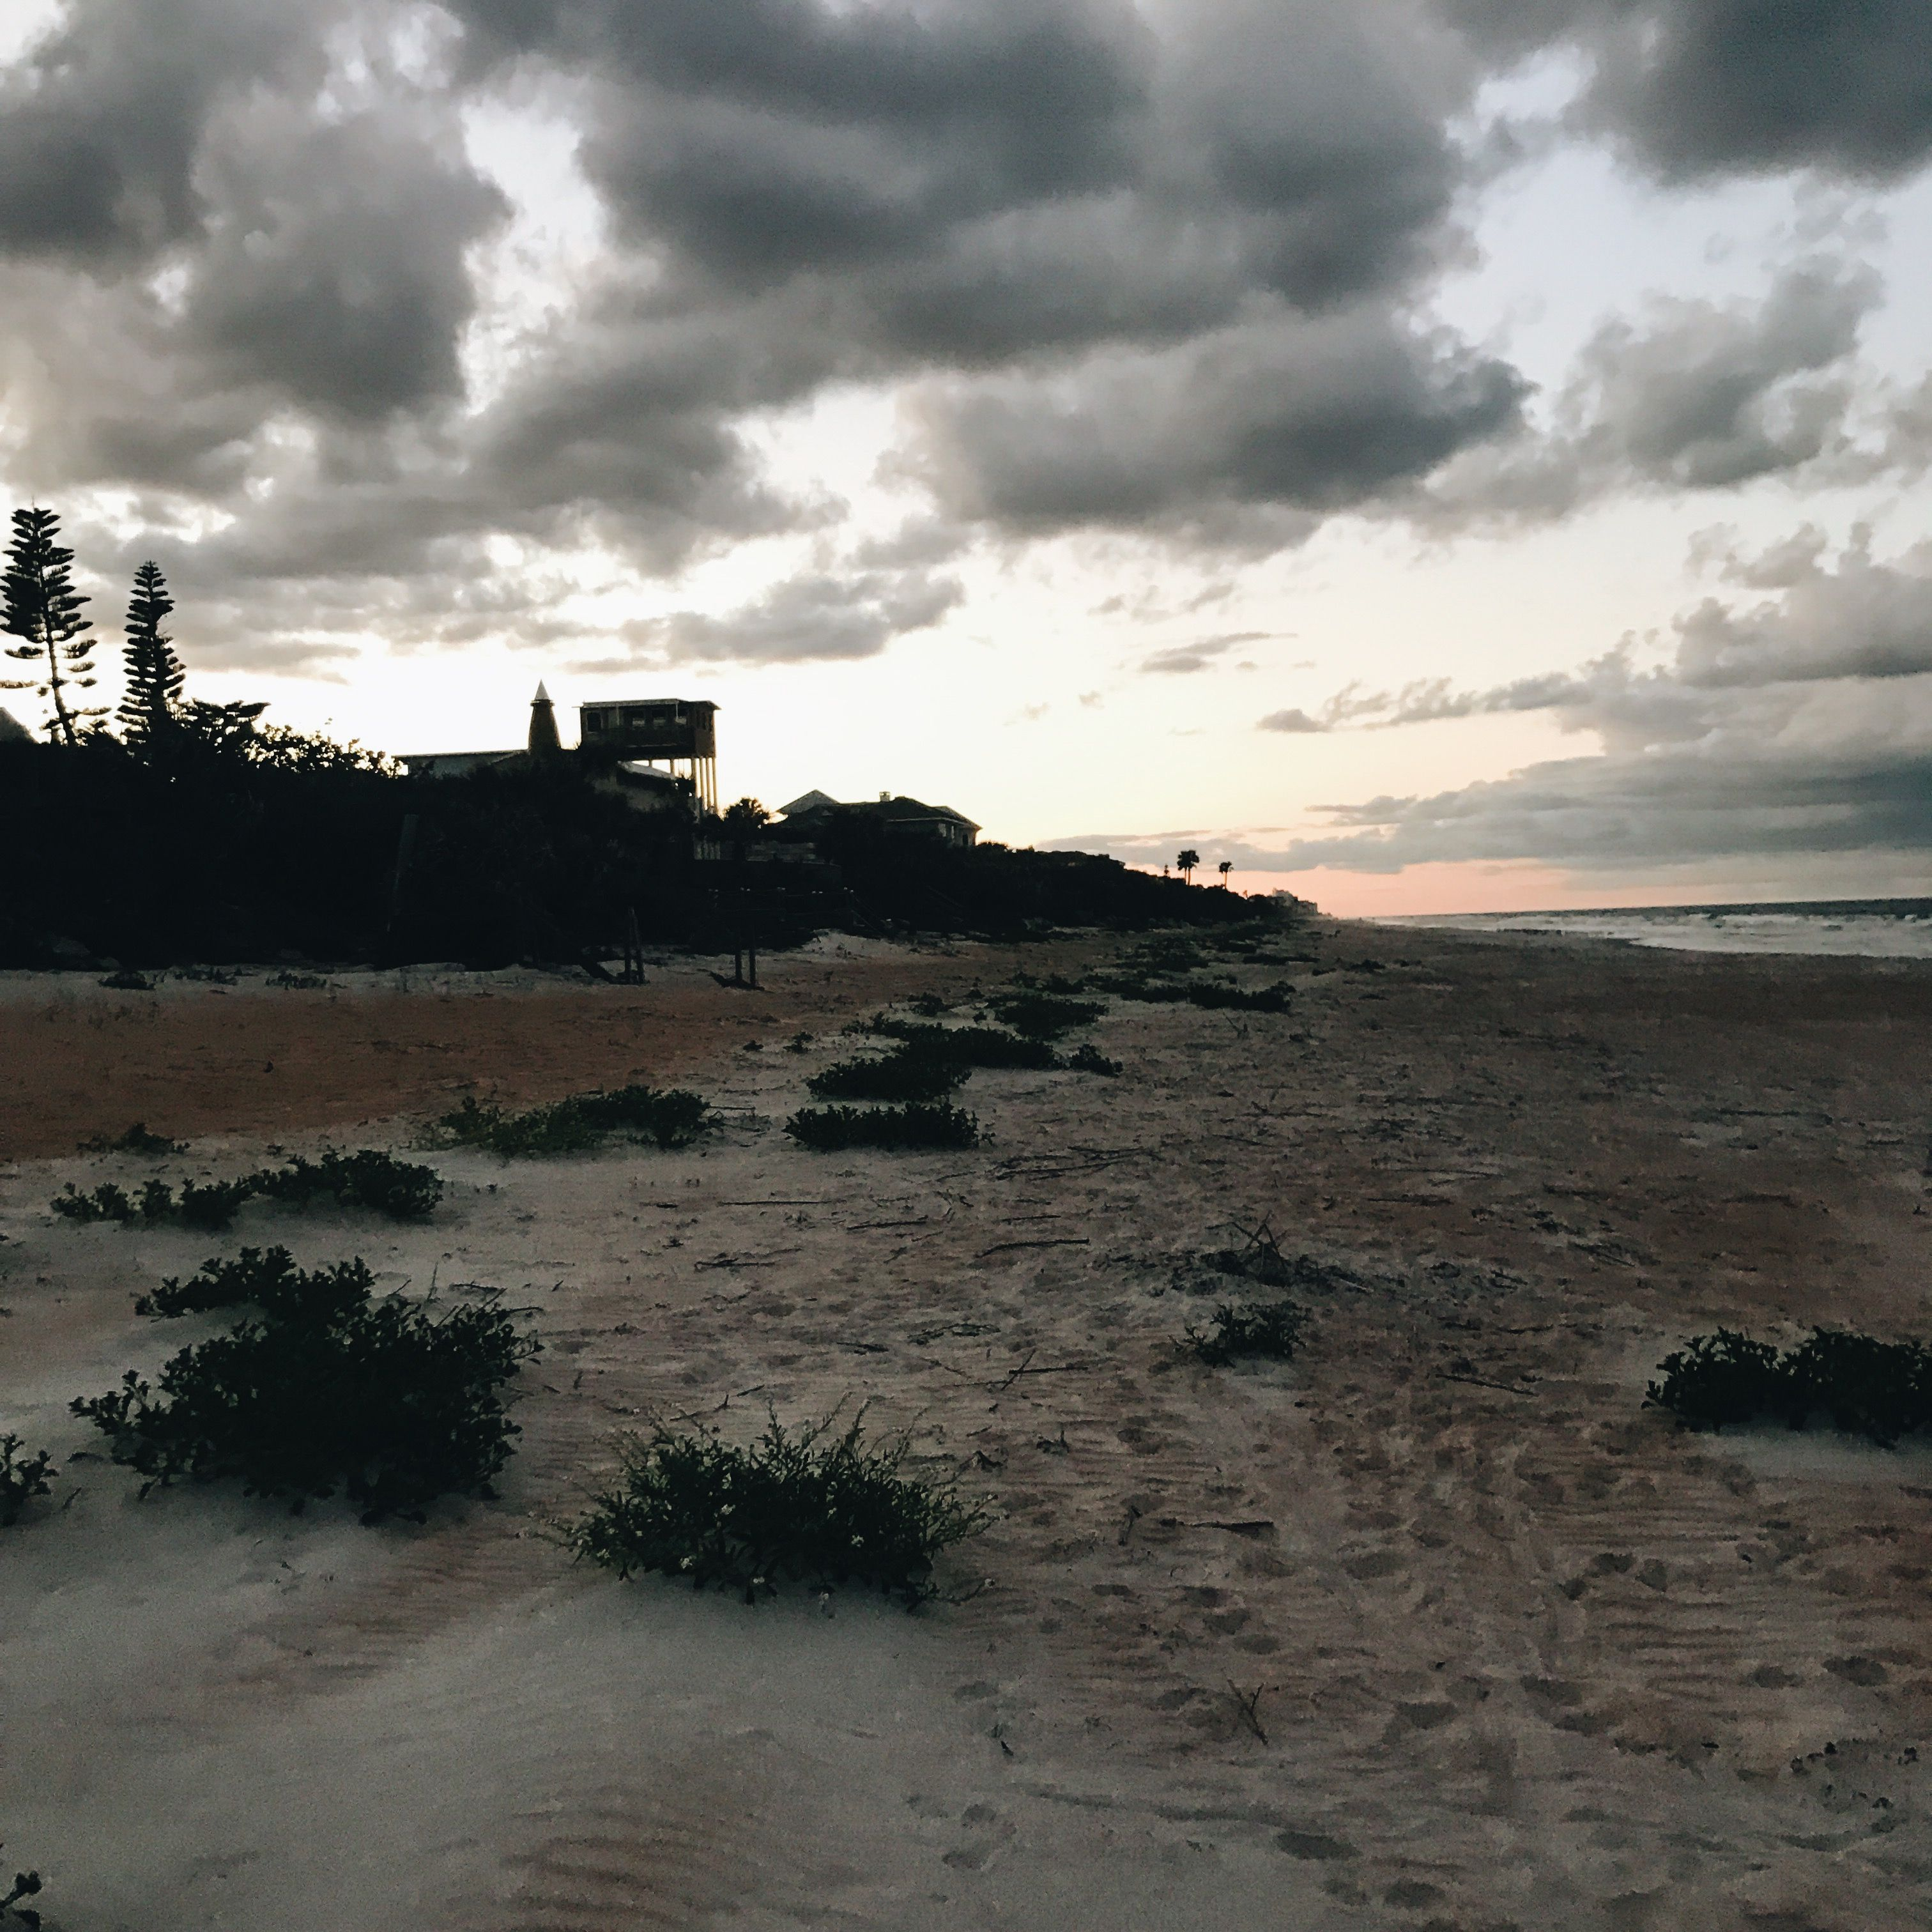 Instagram Artsy Iphone 7 Vsco Cam App Inspiration Friends Summer Beach Spring